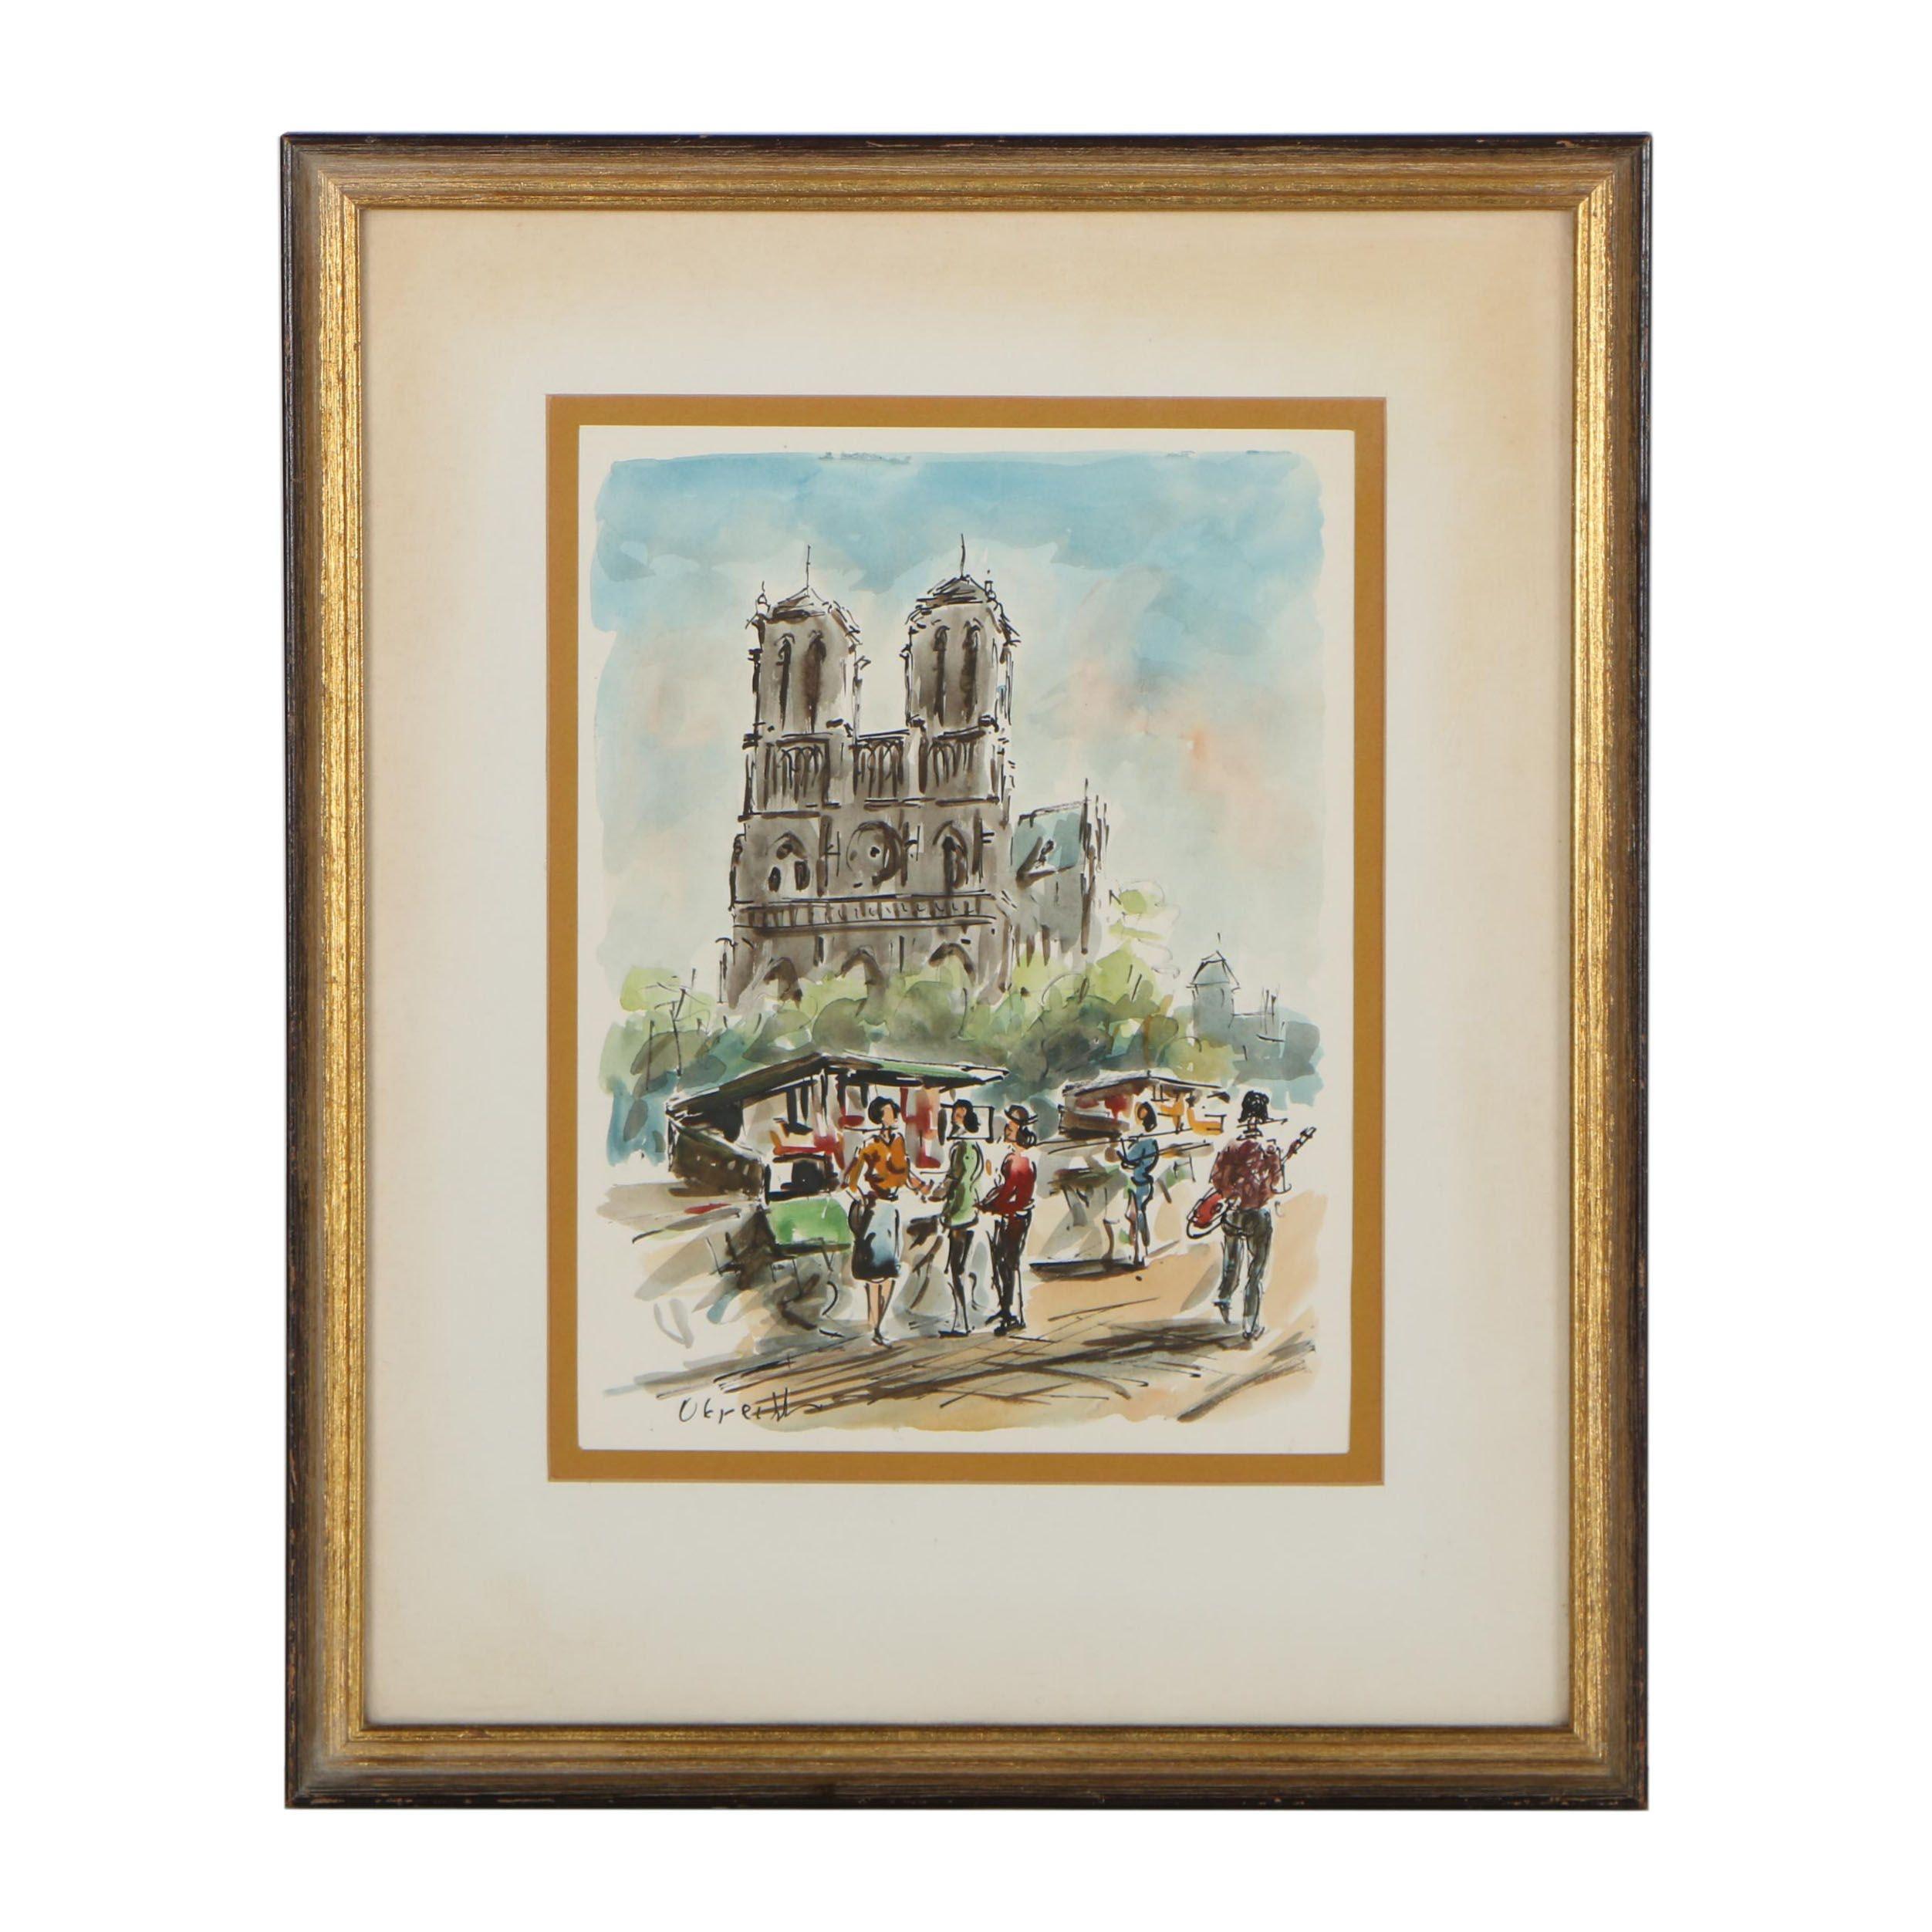 Obrecht Watercolor Painting of Paris Street Scene